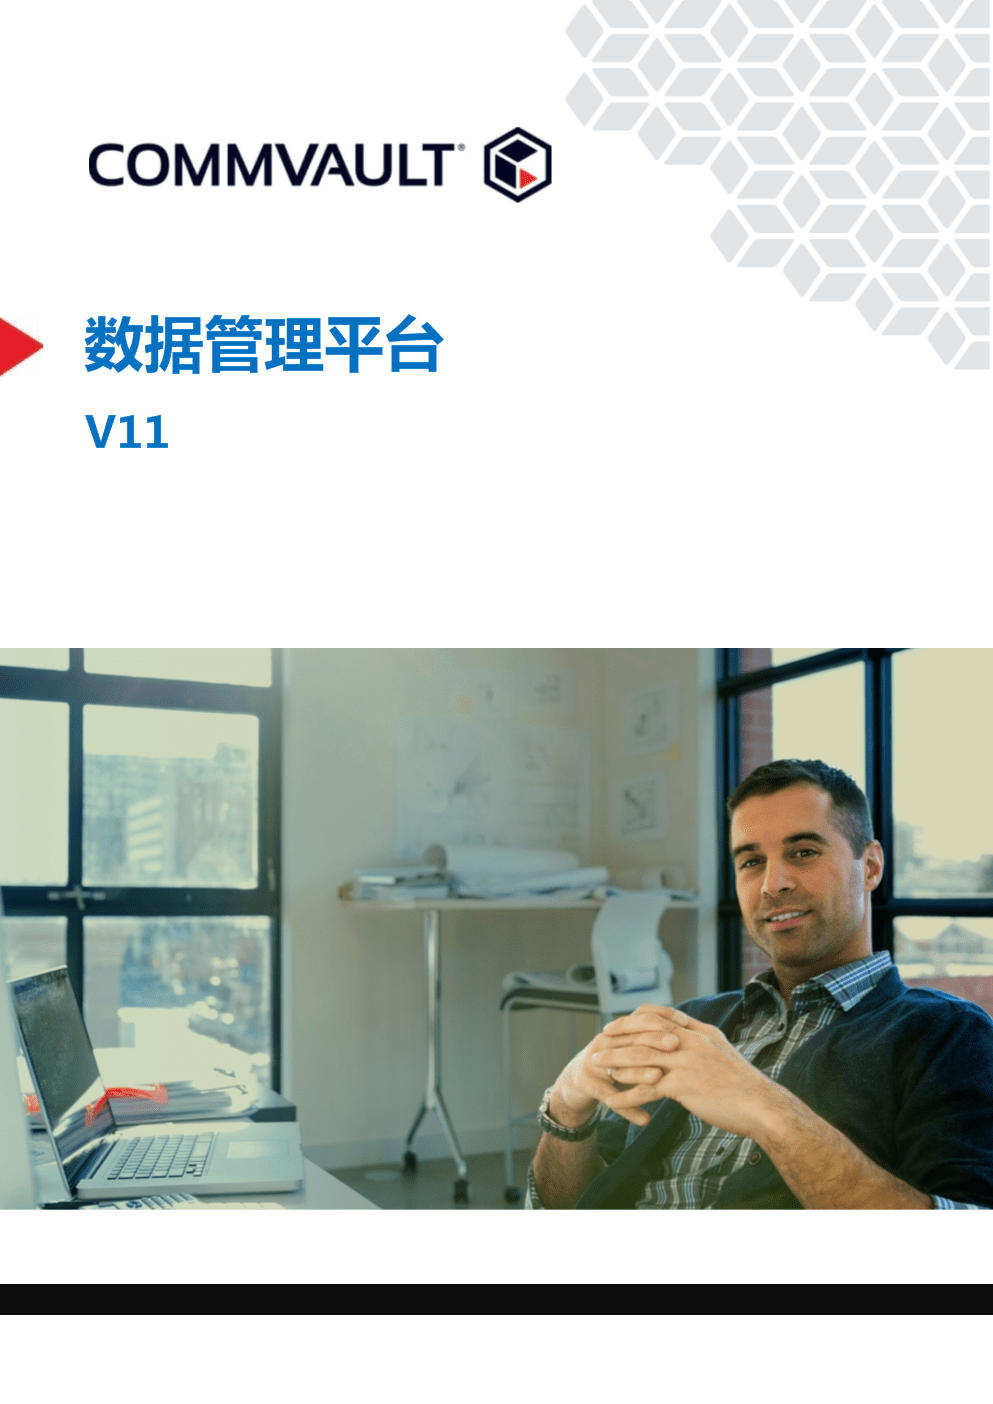 Commvault数据管理平台V11白皮书(20160509).docx